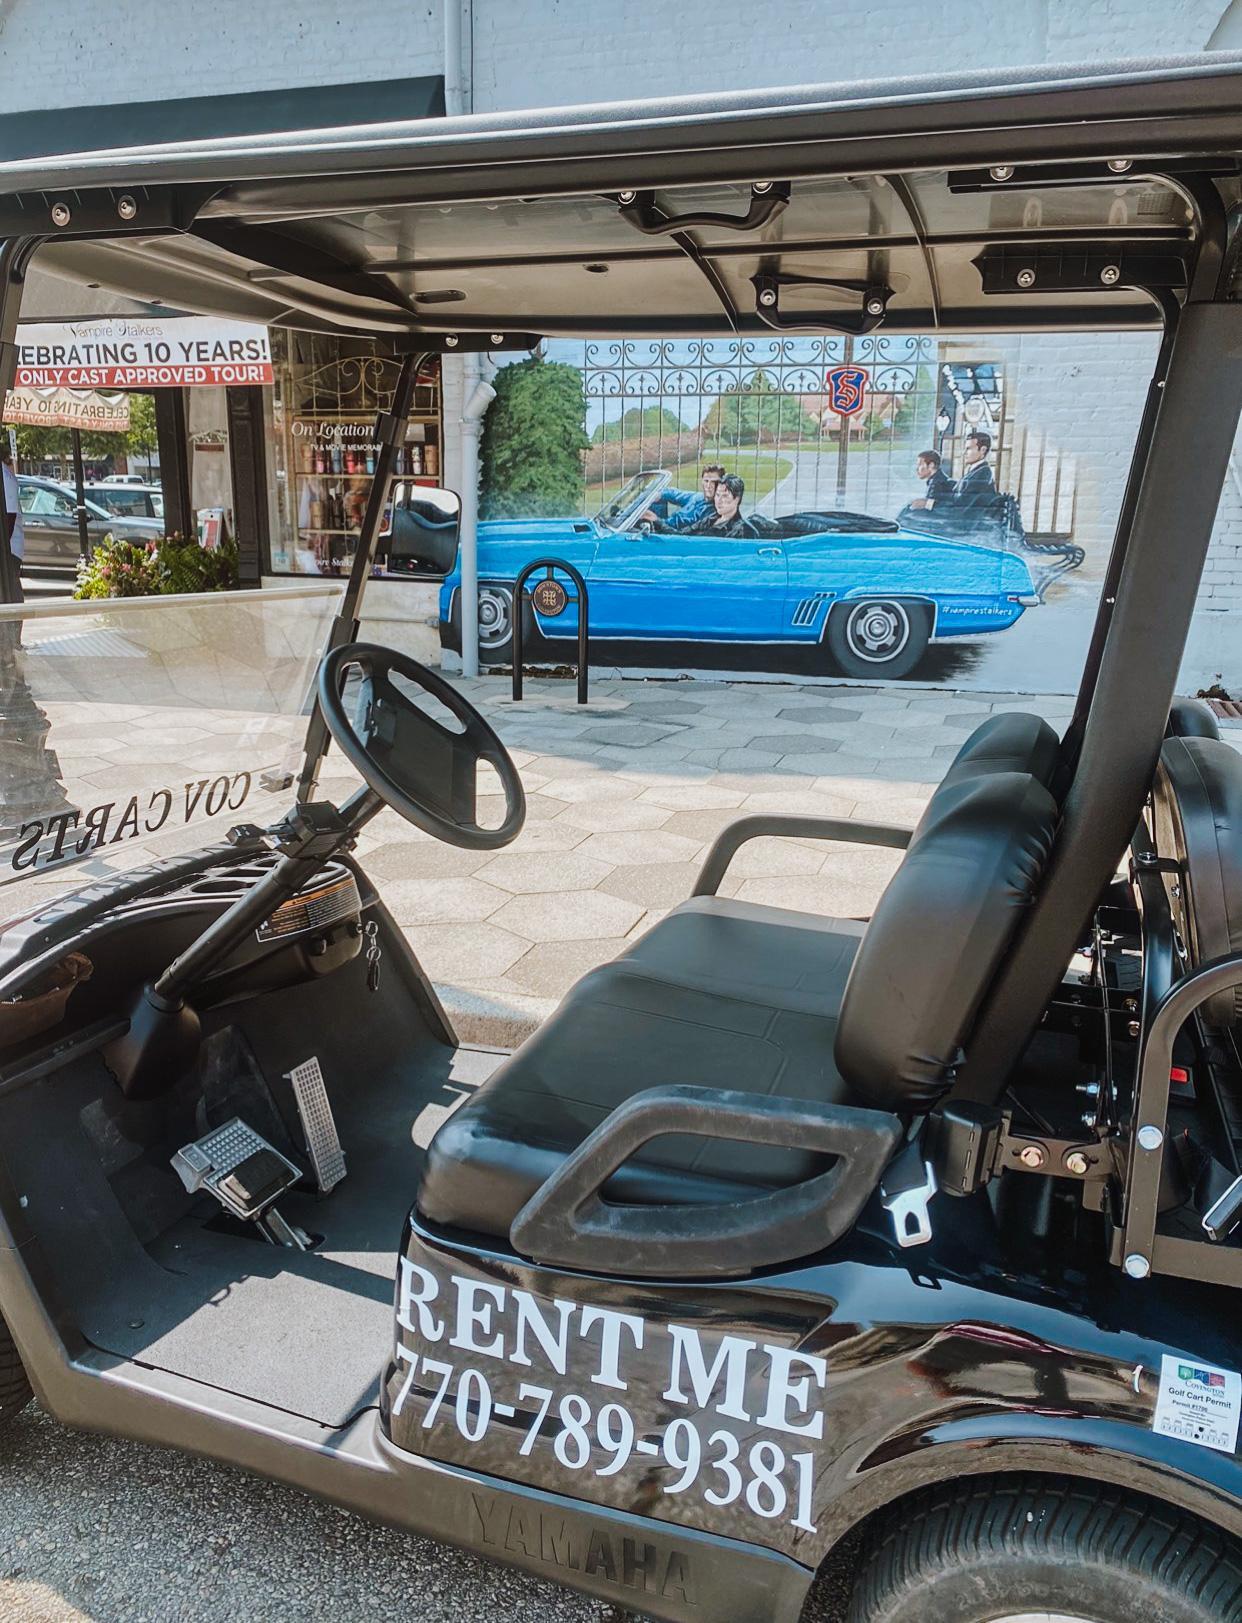 self-guided golf cart tour of mystic falls